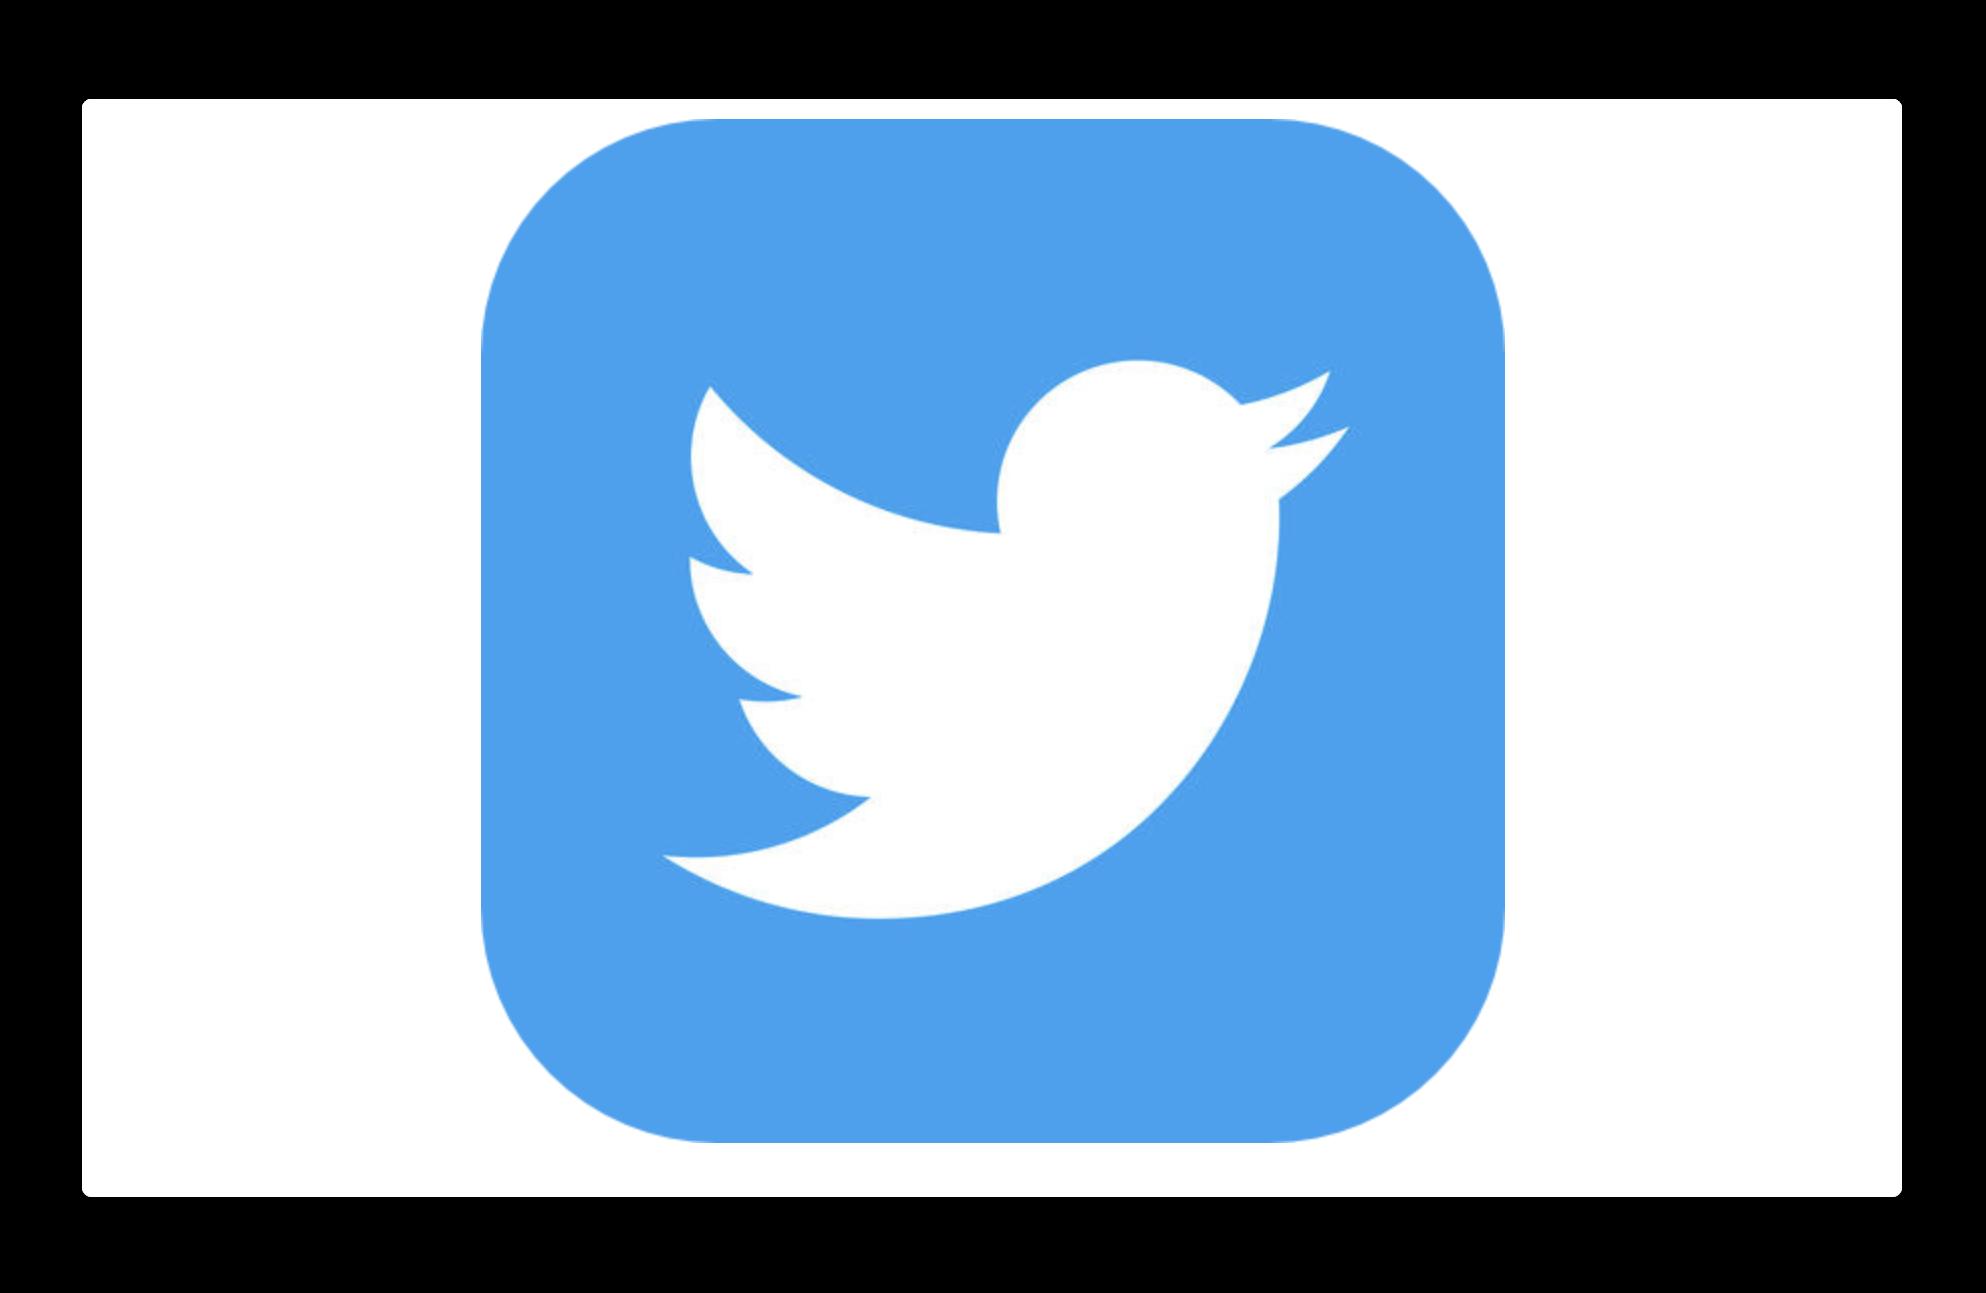 【iOS】Twitterの2要素認証を設定する方法